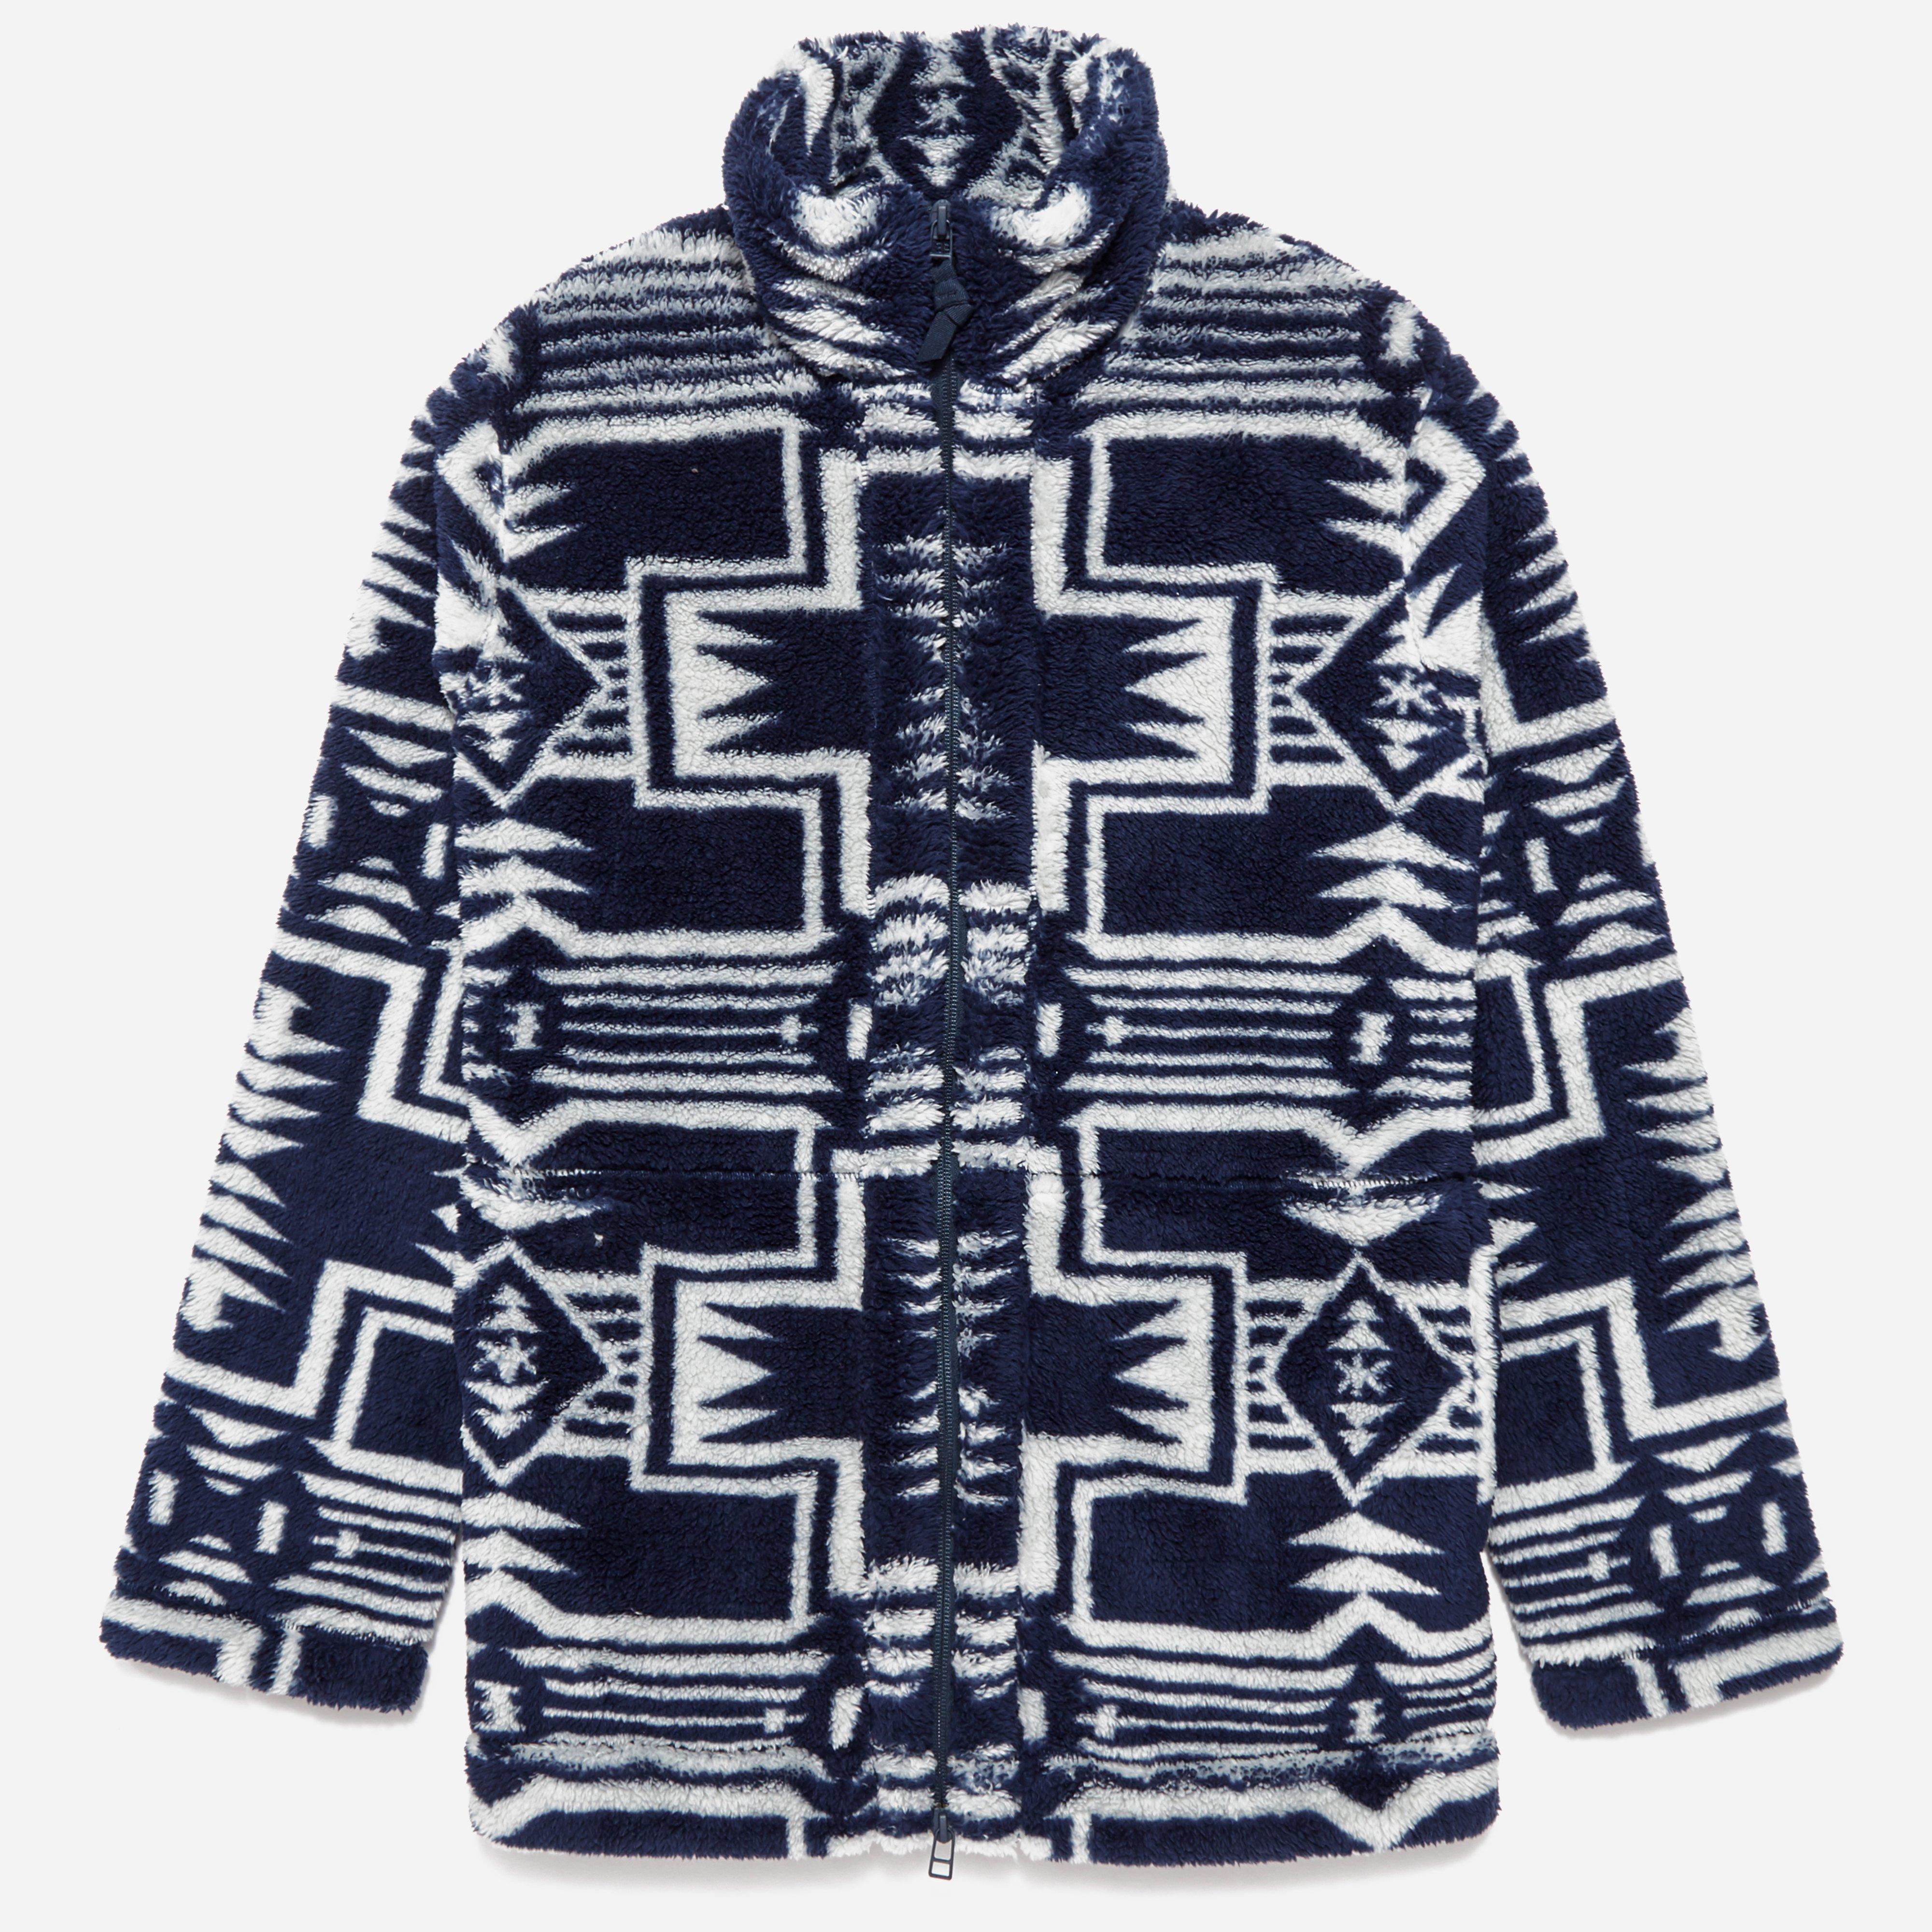 Snow Peak Printed Fleece Jacket